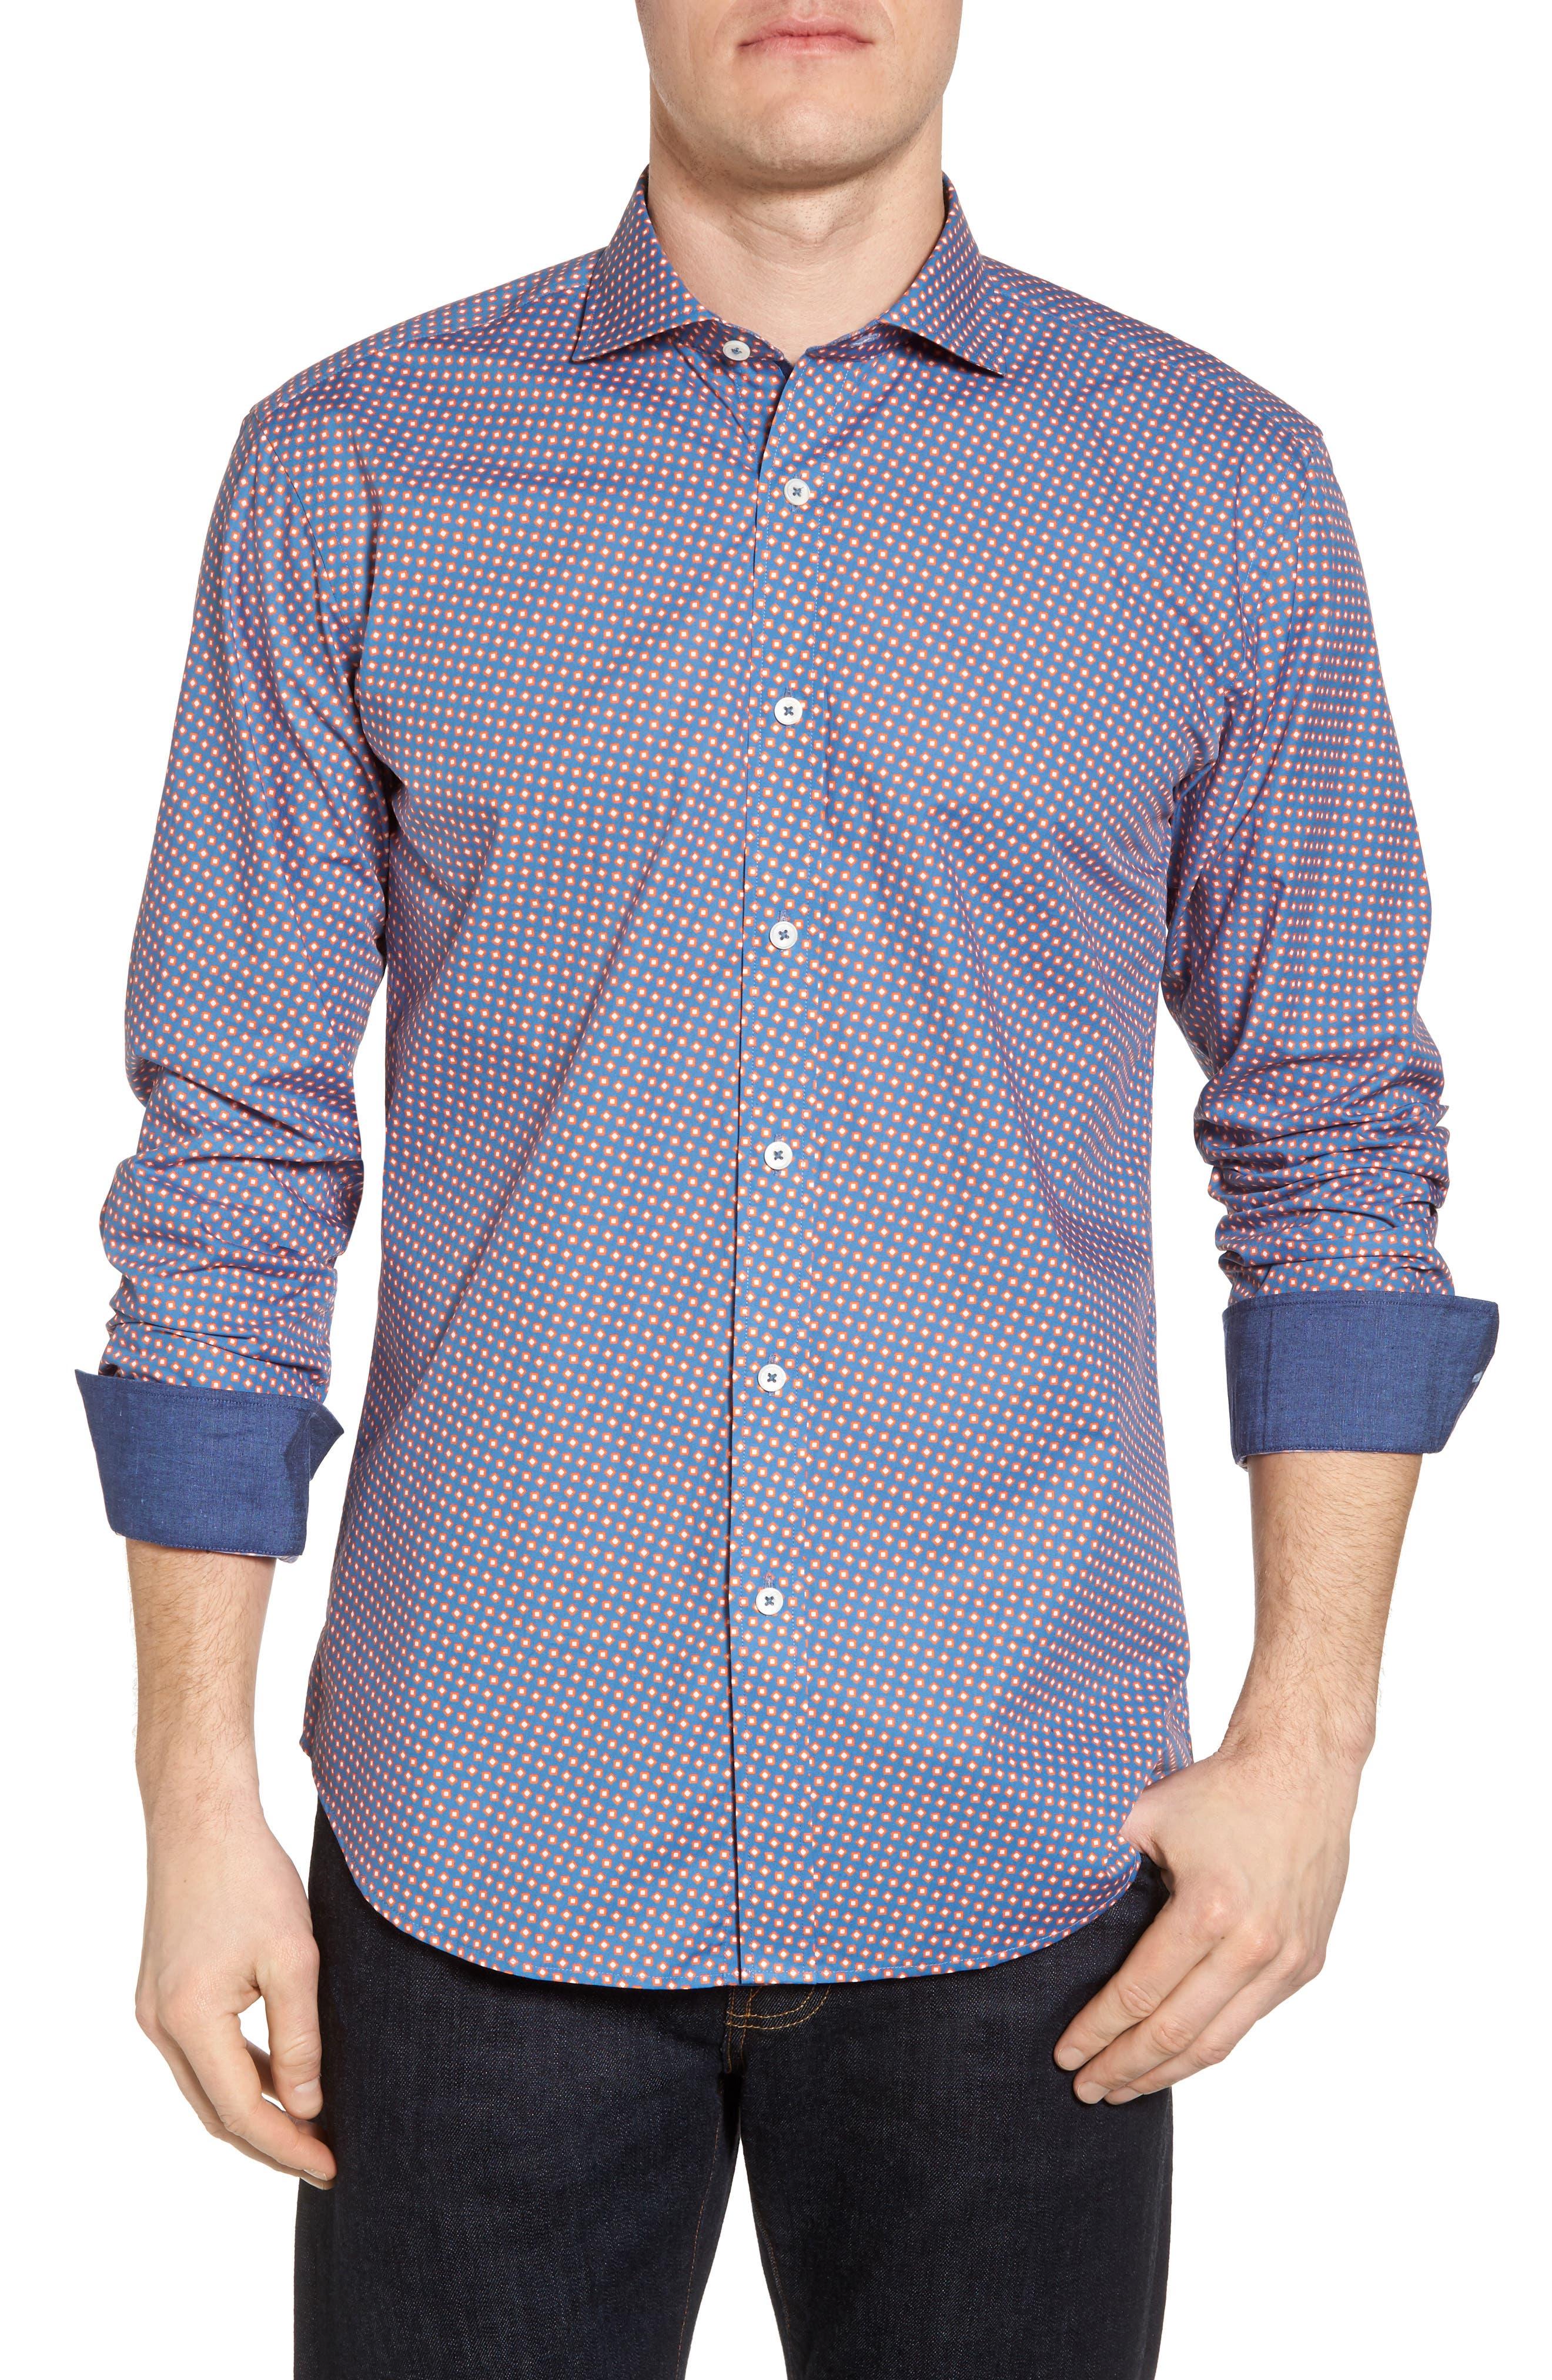 Alternate Image 1 Selected - Bugatchi Slim Fit Print Sport Shirt